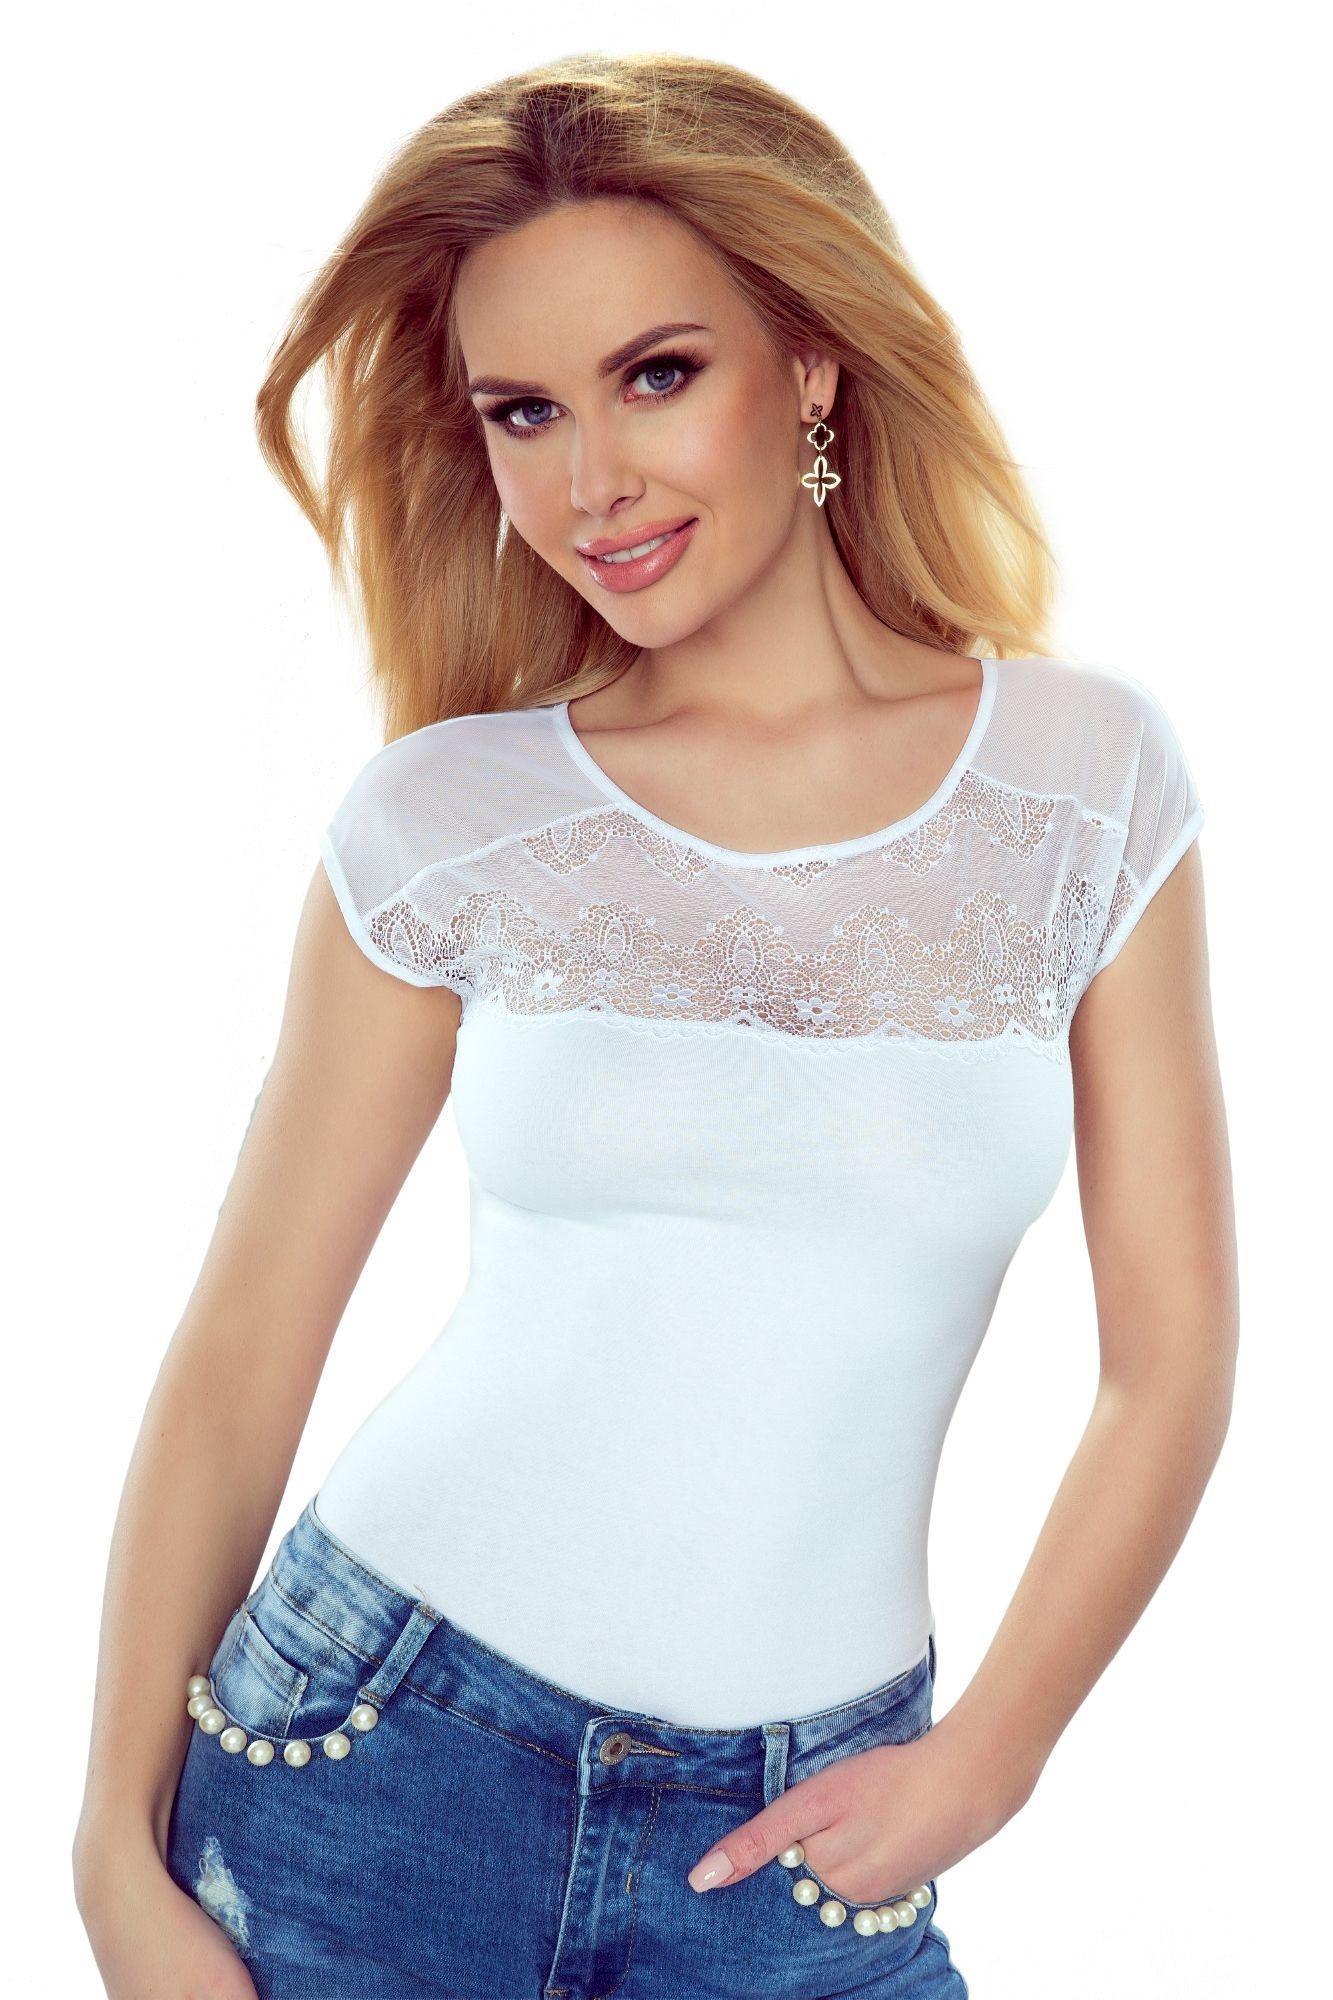 c52b69d3790f Dámske tričko Marita biele s čipkovaným dekoltom - ELEGANT.sk